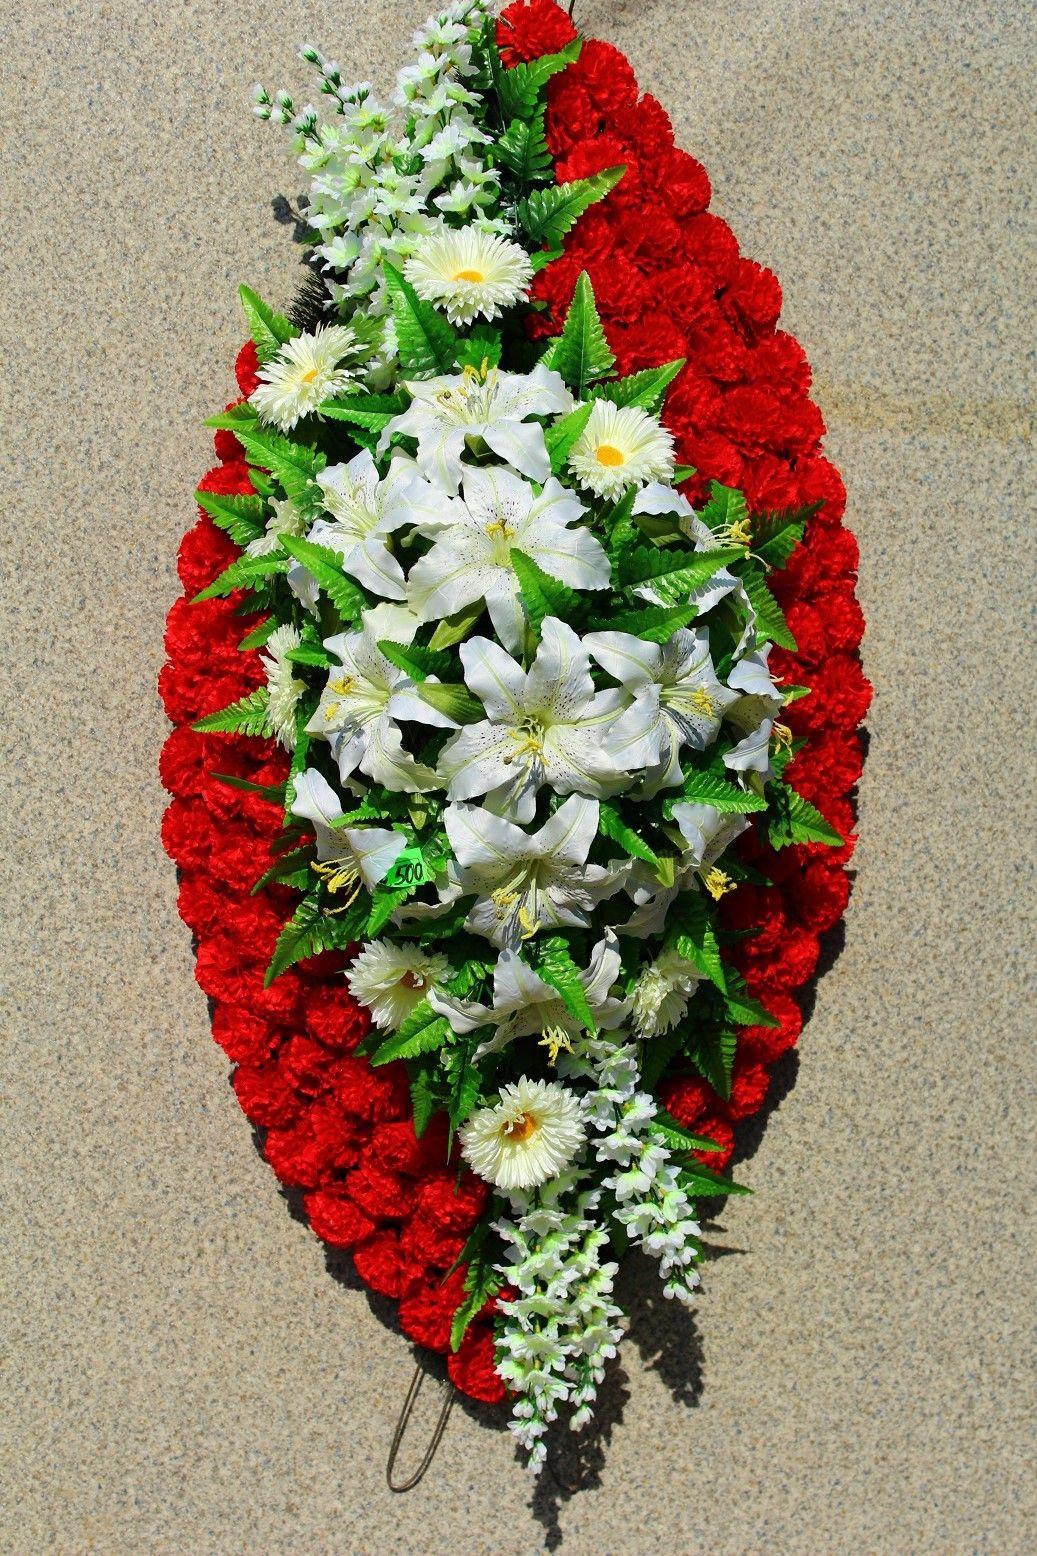 Ritulne vencie umel vence vence pohreb model 040 predm beautiful funeral arrangements ideas easy to make it izmirmasajfo Choice Image